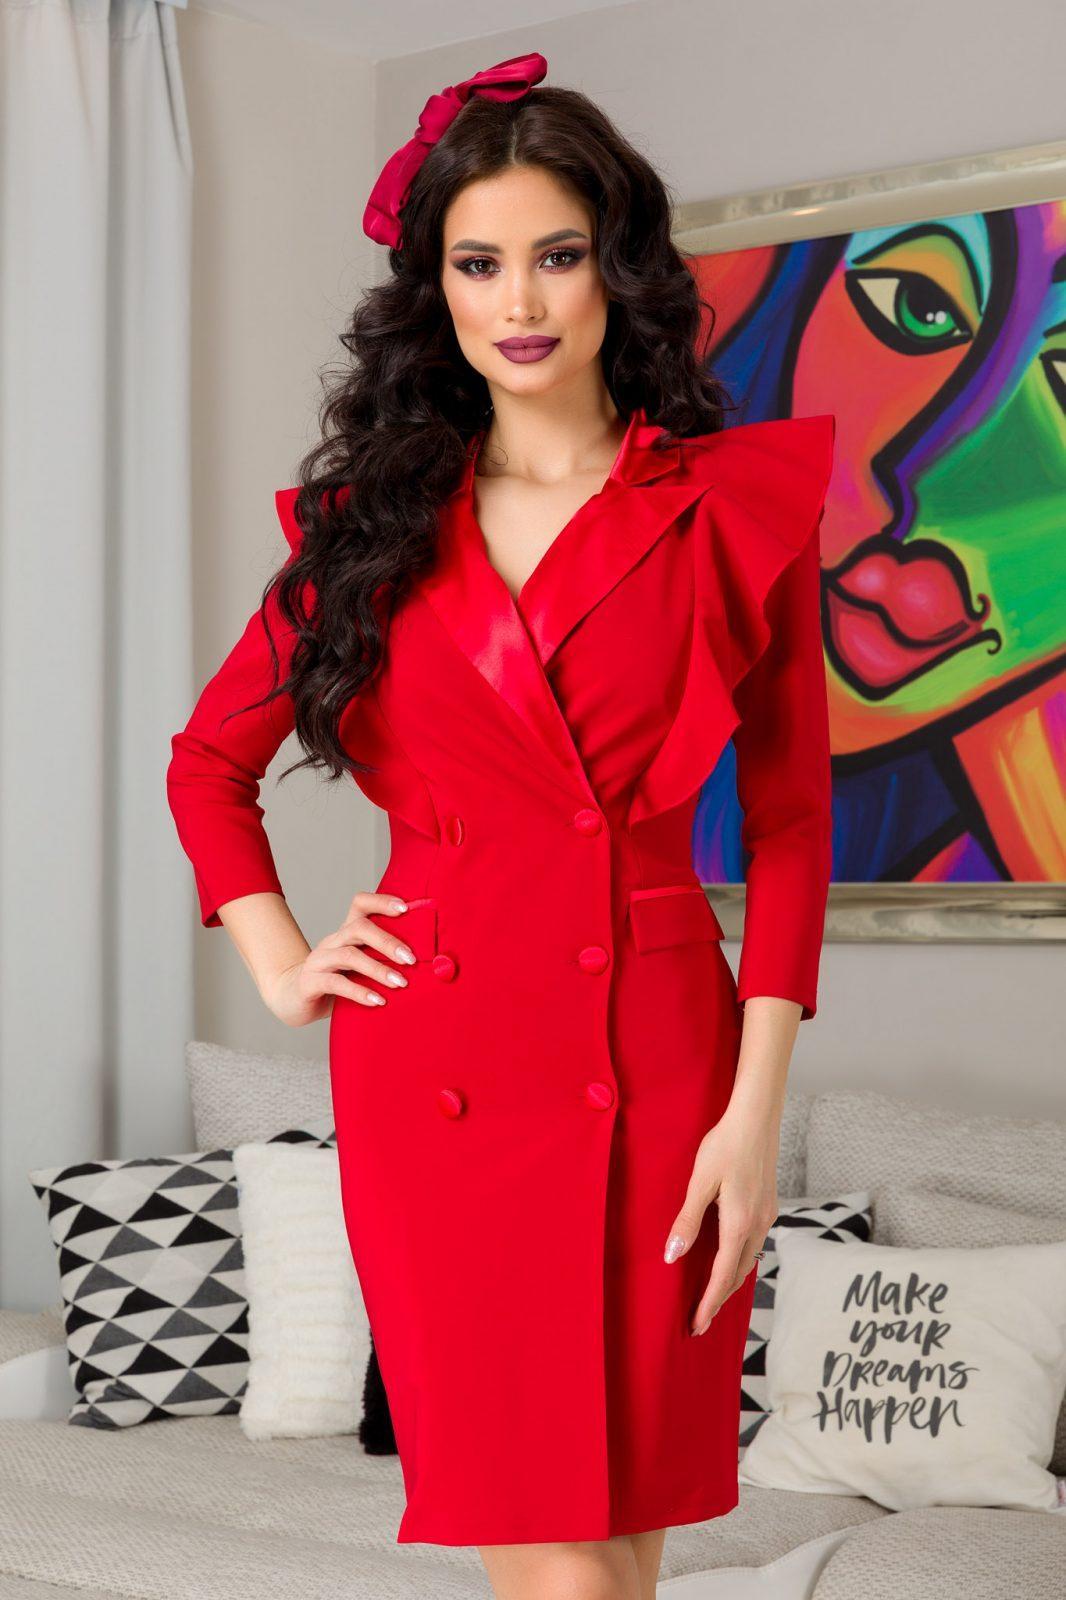 Sasha Red Dress